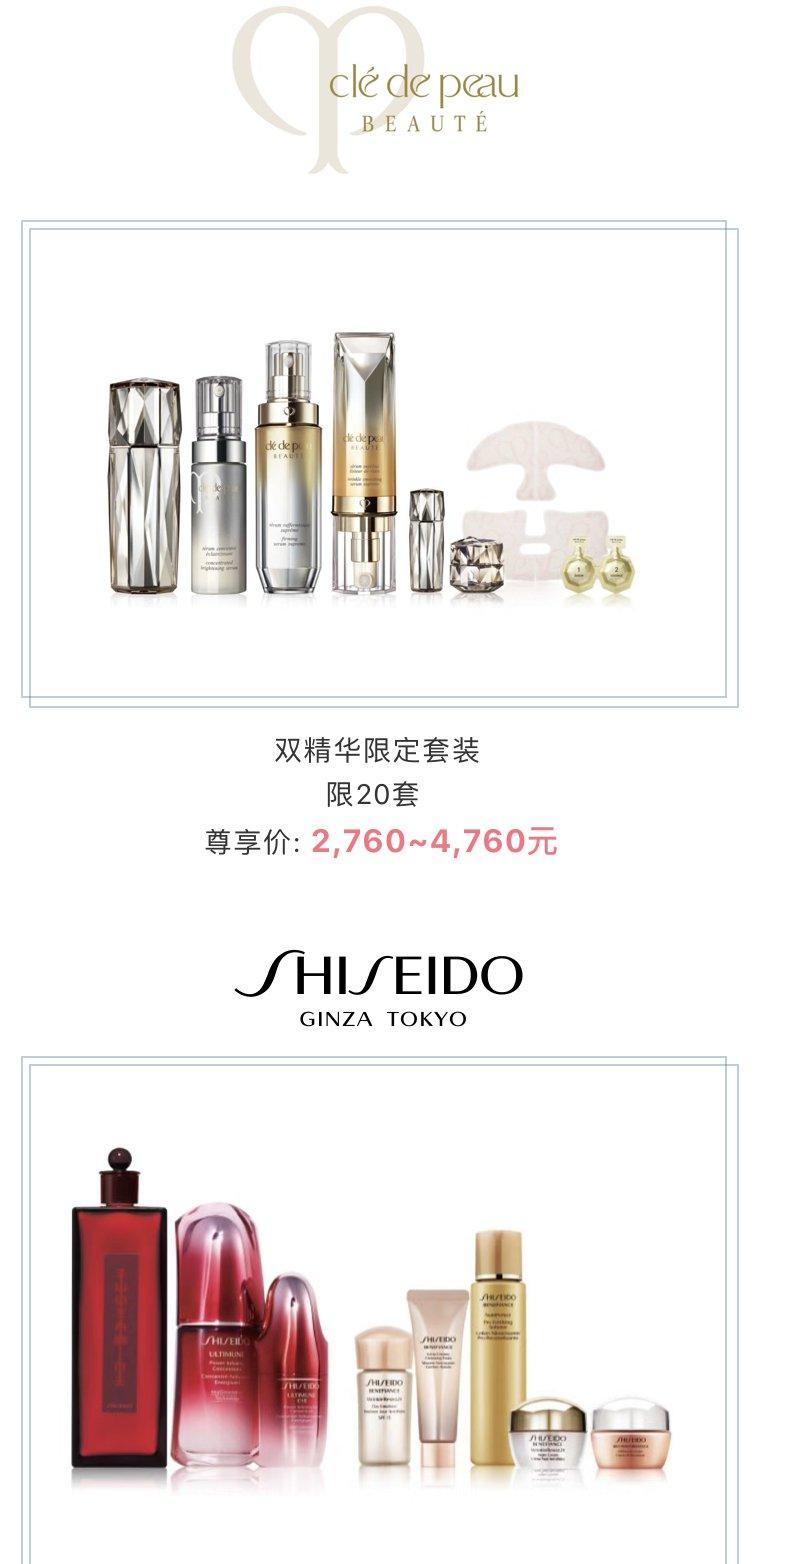 上海伊(yi)勢(shi)丹百貨(huo)22周年慶(qing) 化妝品2倍積分(fen)